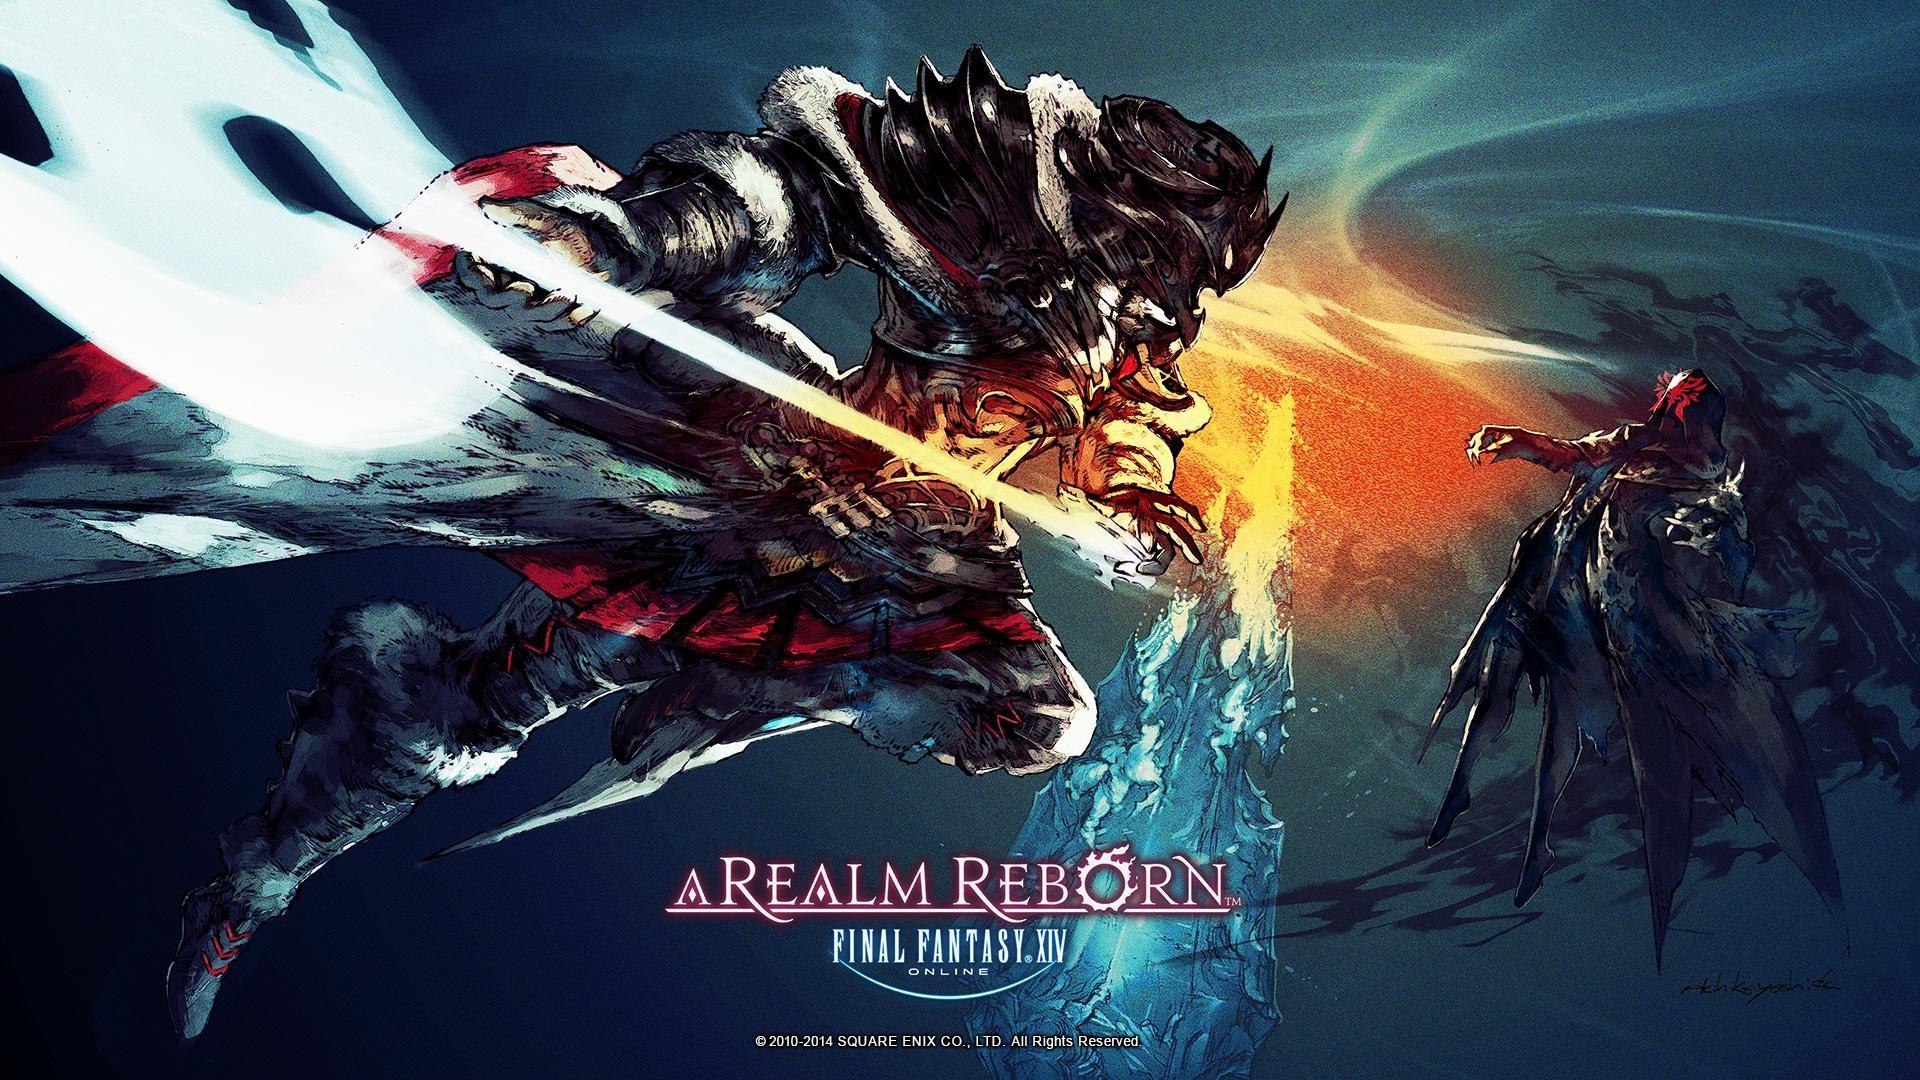 Final Fantasy Xiv A Realm Reborn Fantasy Art Wallpapers: Ffxiv HD Wallpaper (94+ Images